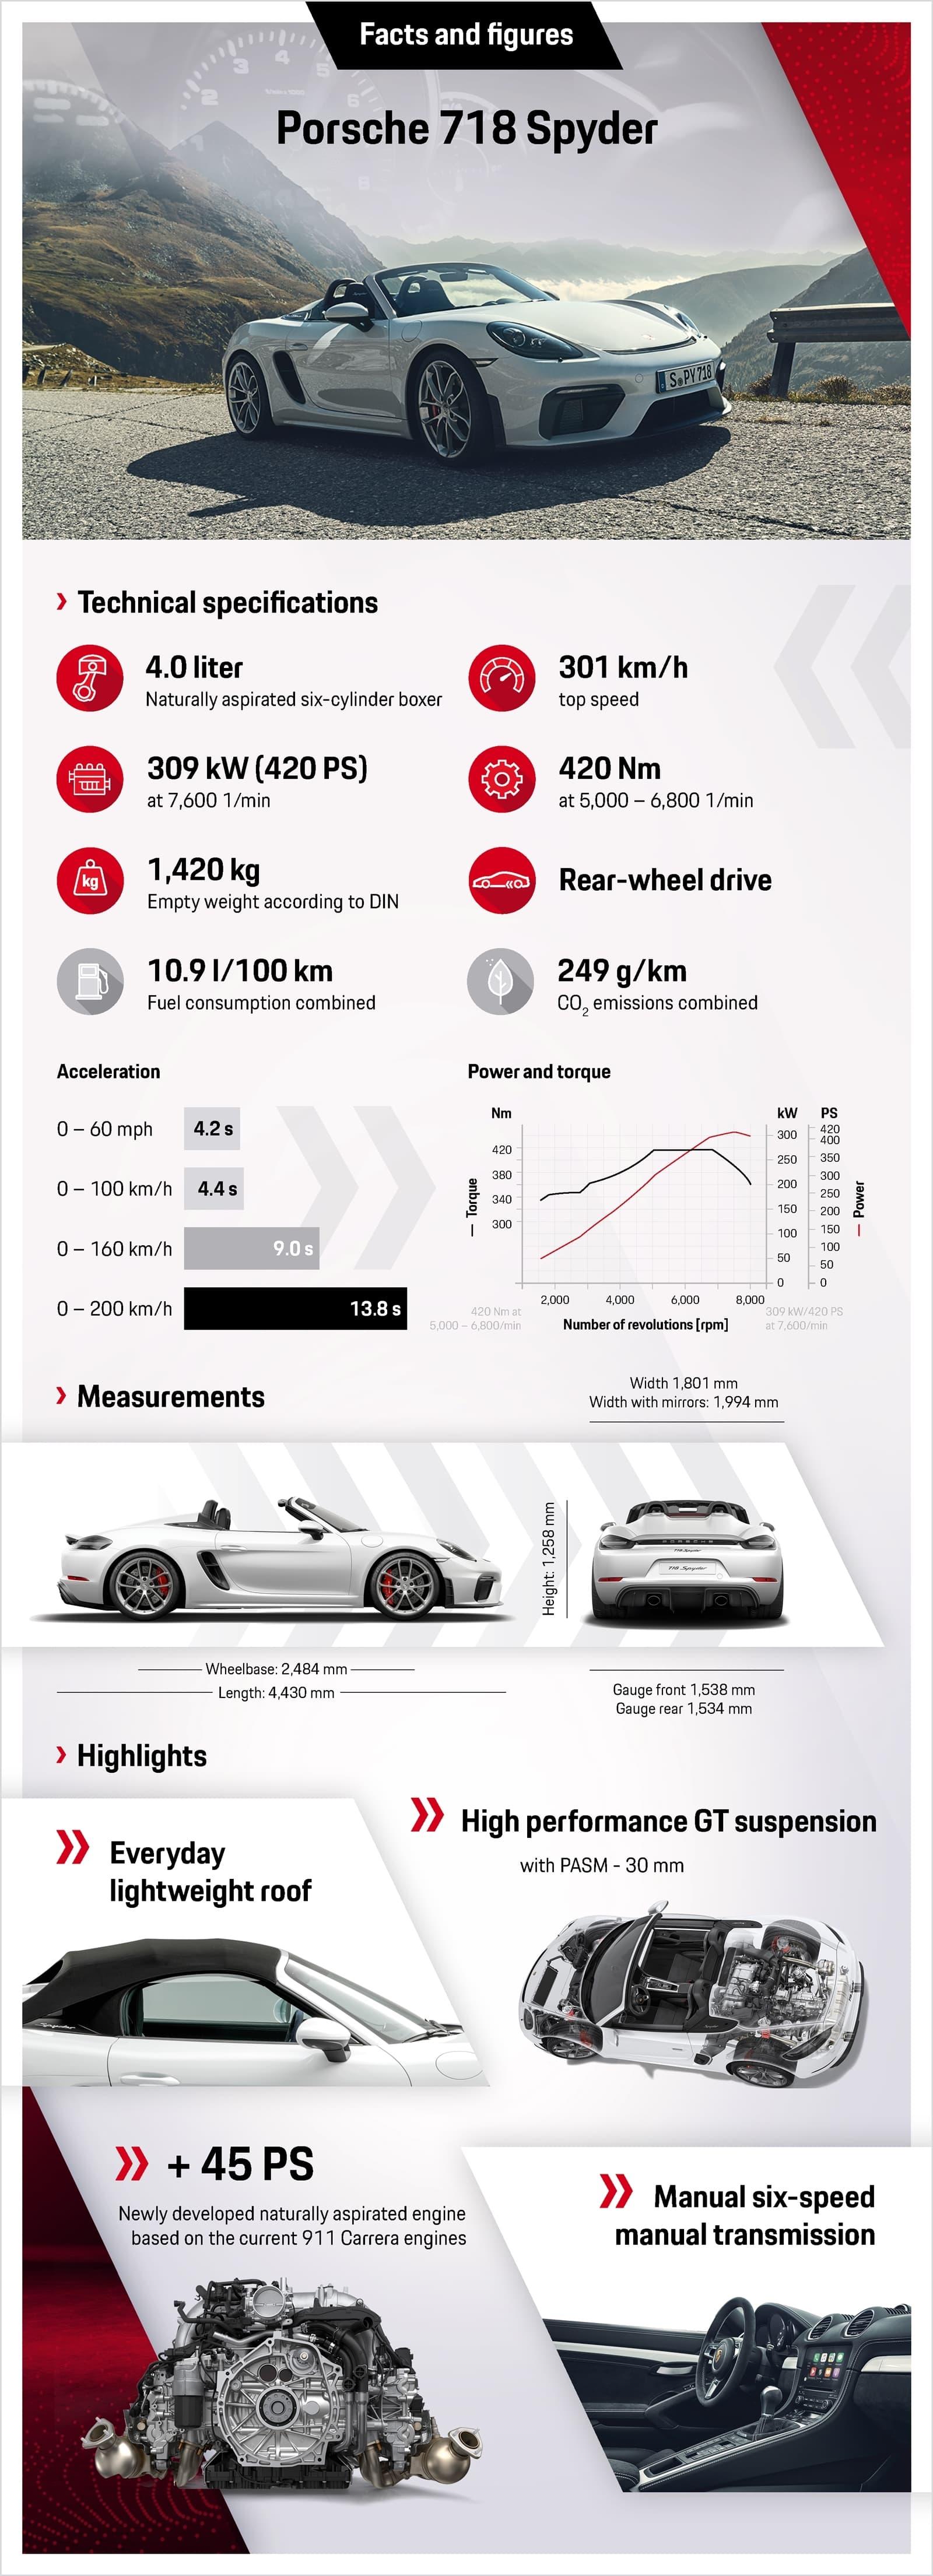 Porsche 718 Spyder 2019 0619 011